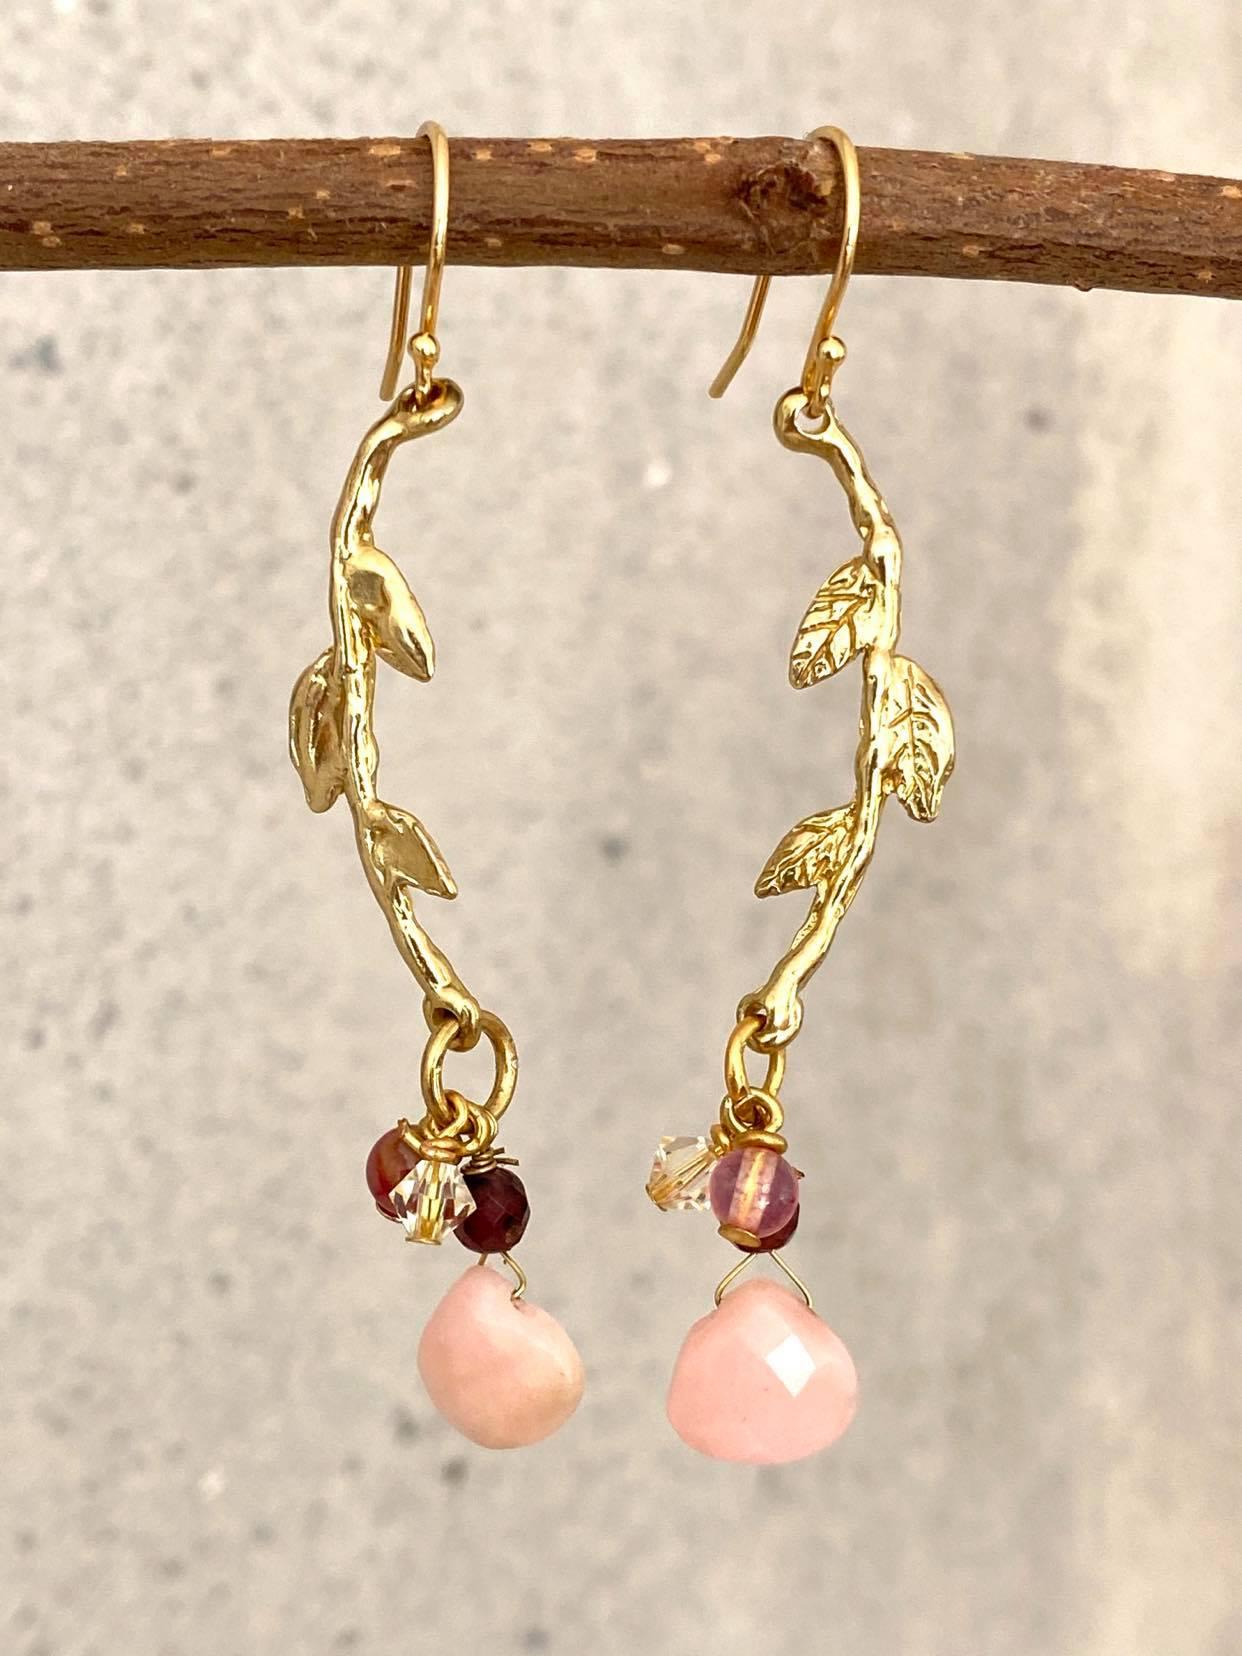 øreringe med rosaopal og gren